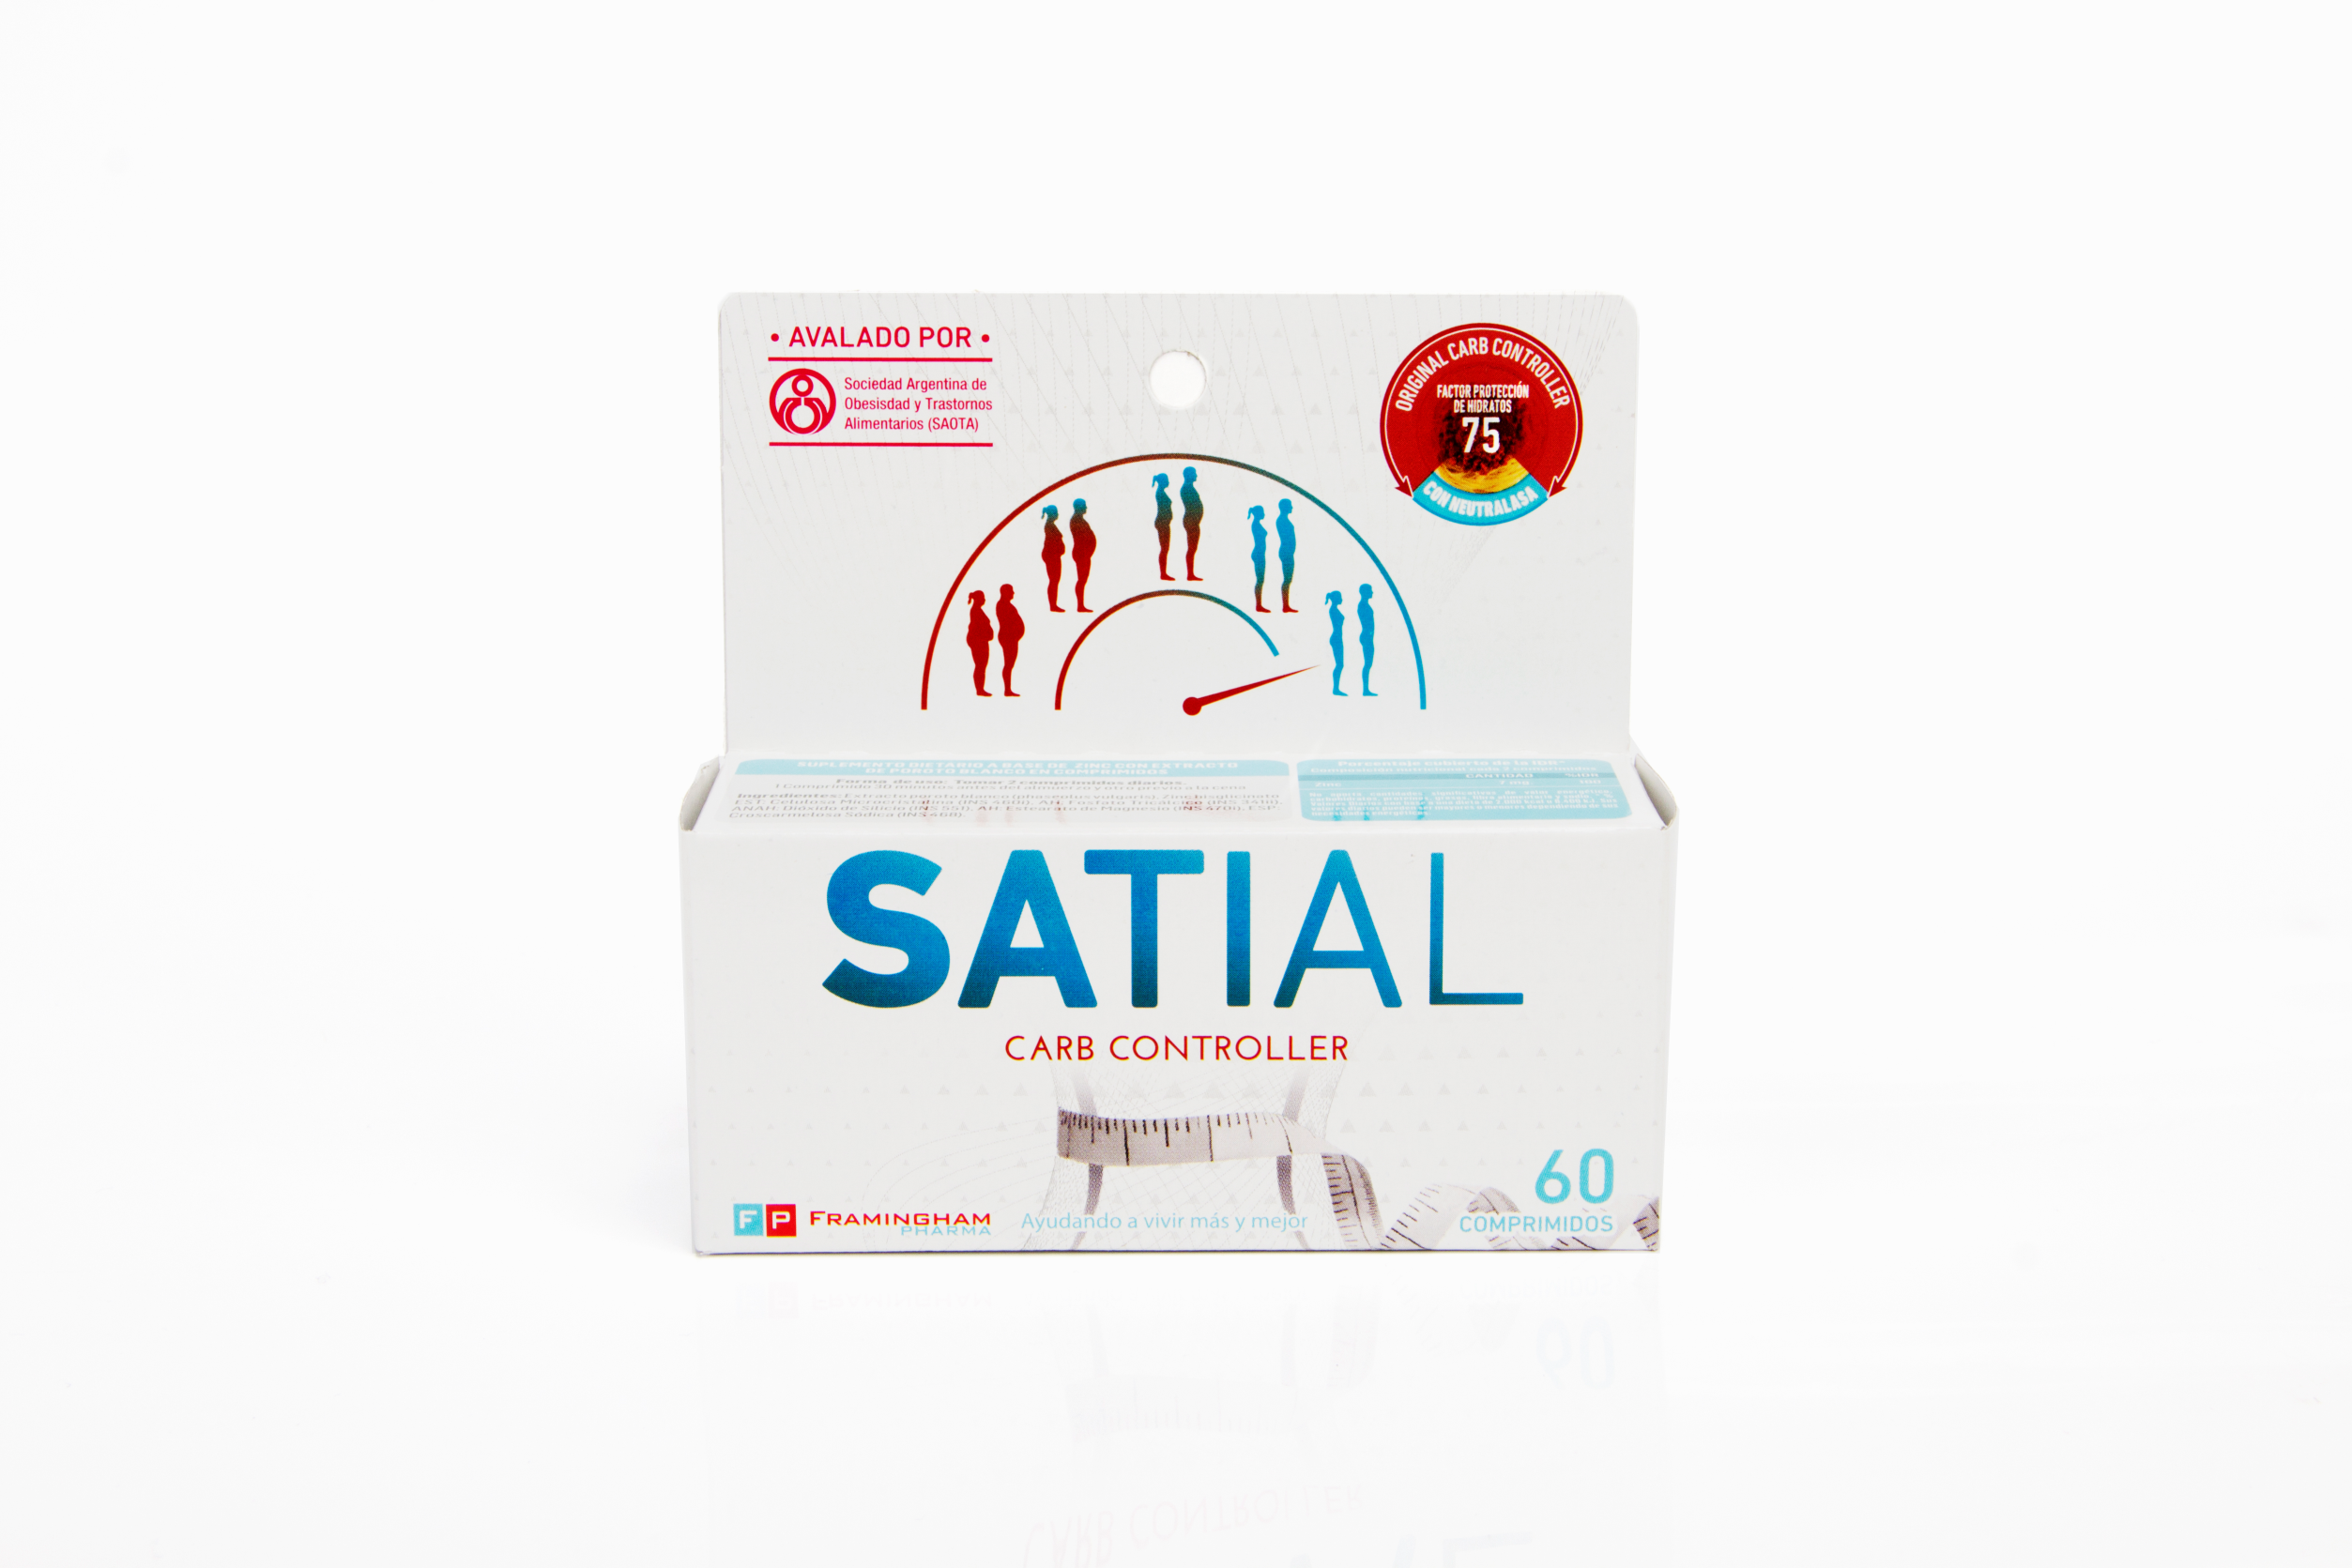 Satial Carb Controller 60 Comprimidos